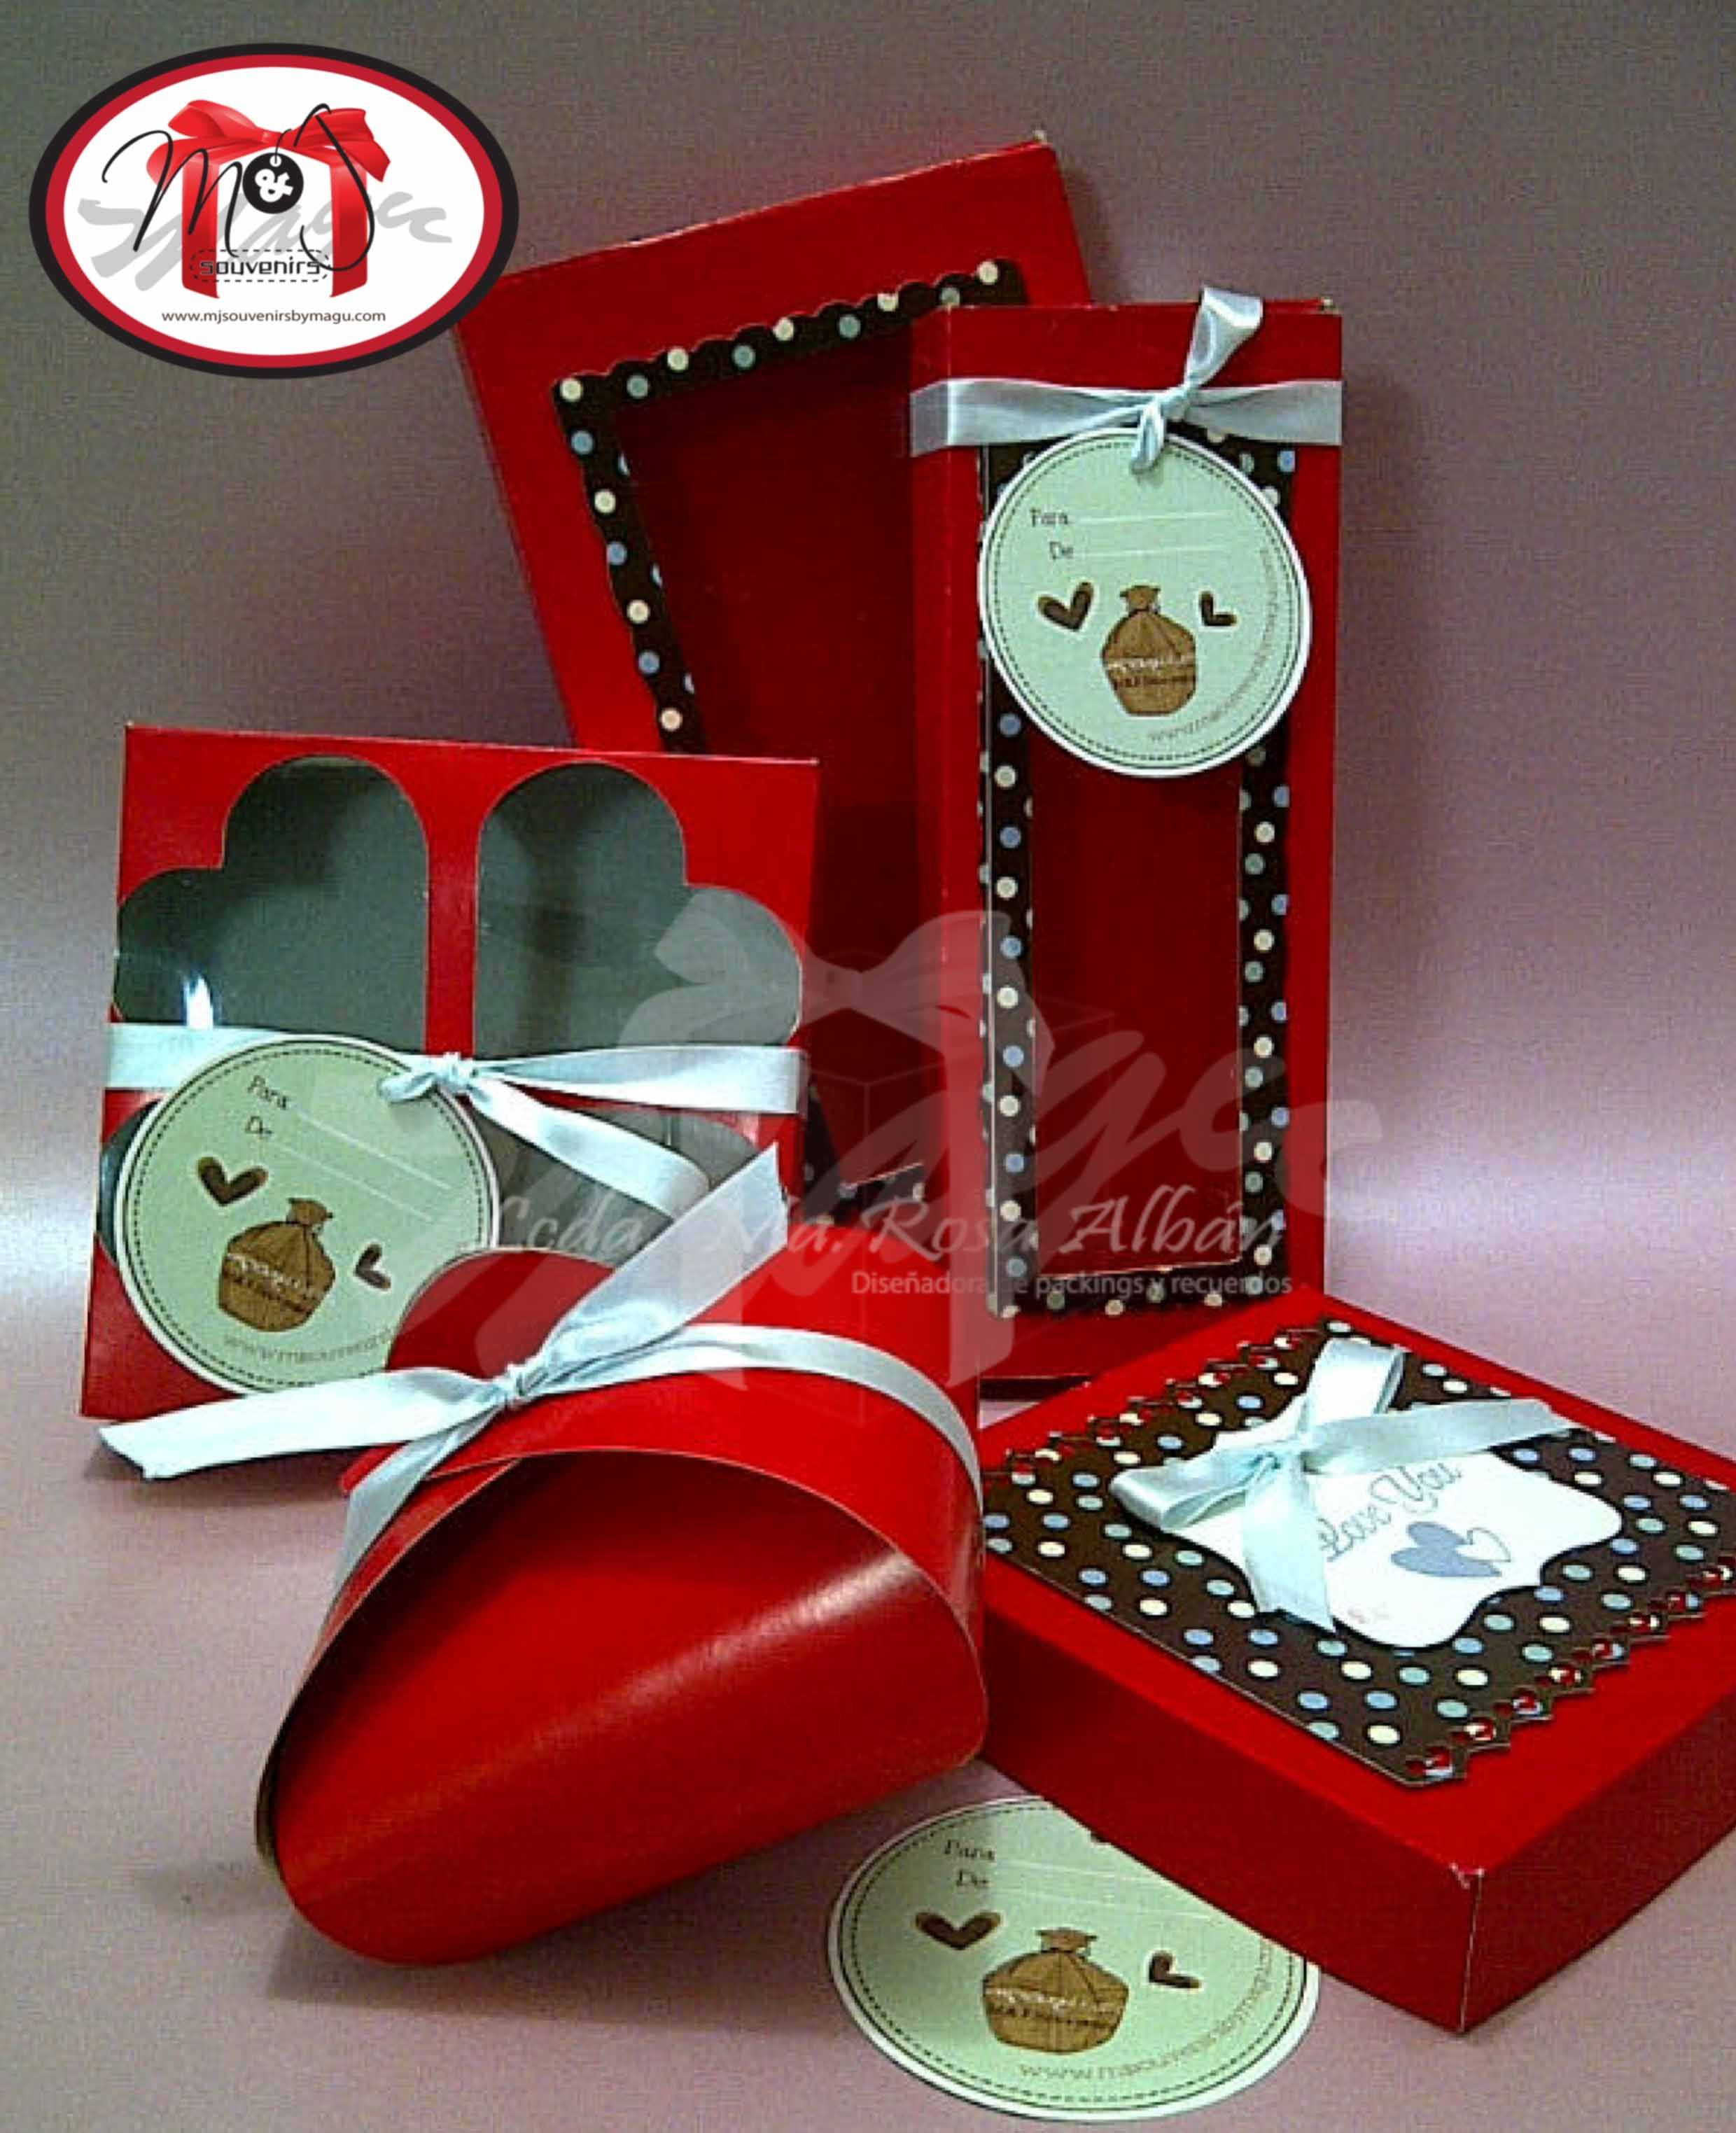 Caja Para Dulces Galletas Alfajores Chocolates Chocotejas Tematica Personalizada Materiales Cartulina Cinta Acetato Gift Wrapping Gifts Holiday